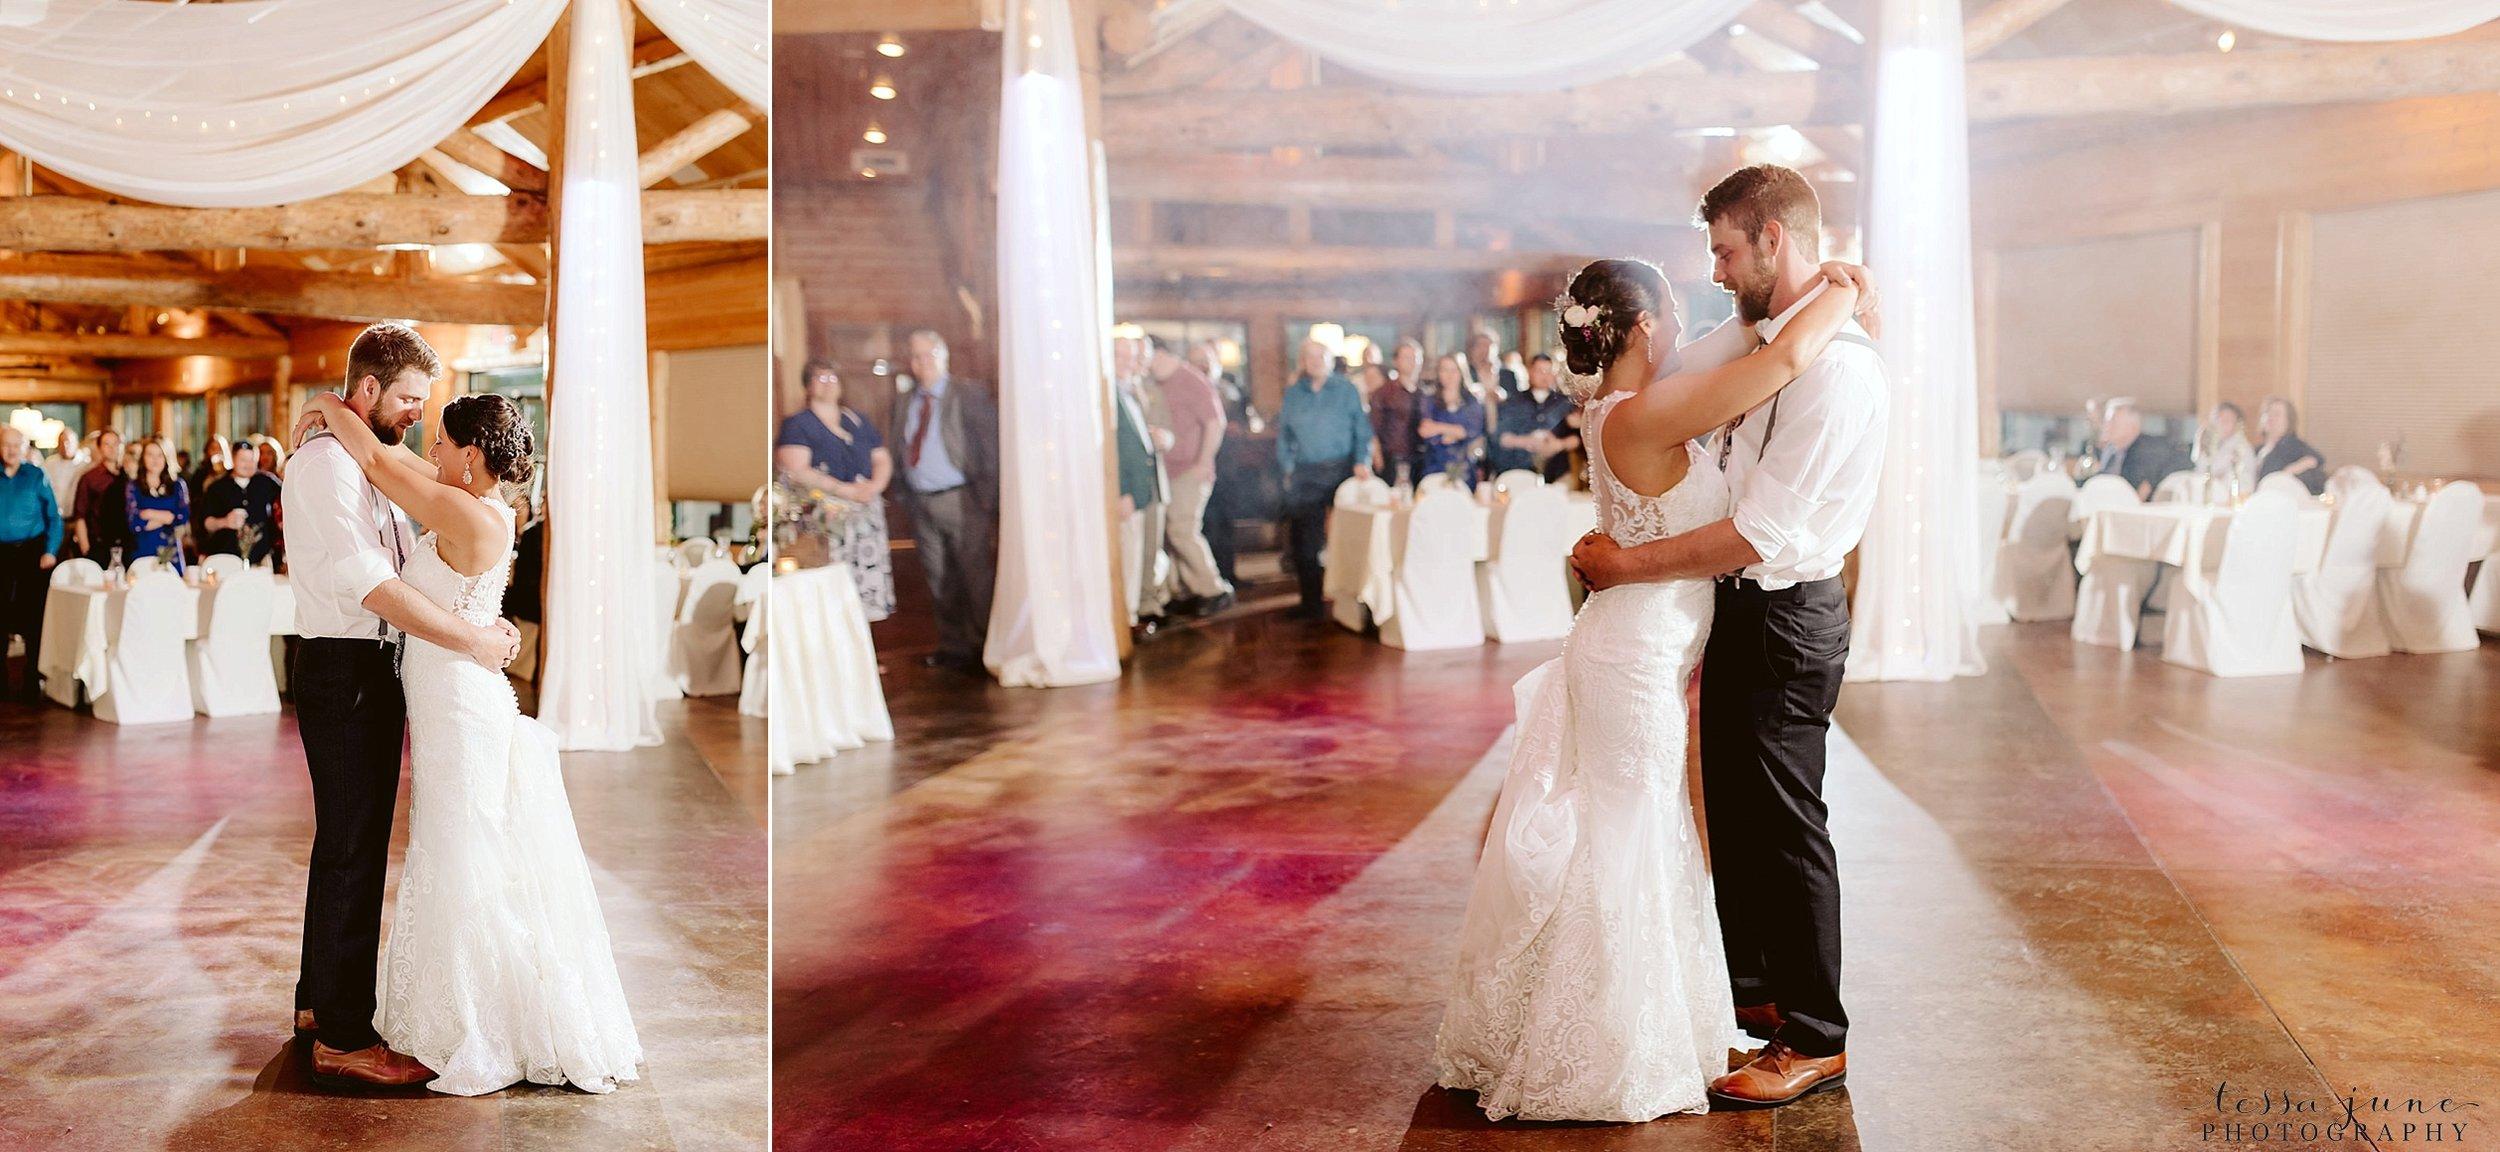 The-grands-at-mulligans-wedding-sartell-minnesota-spring-floral-spring-garden-wedding-145.jpg